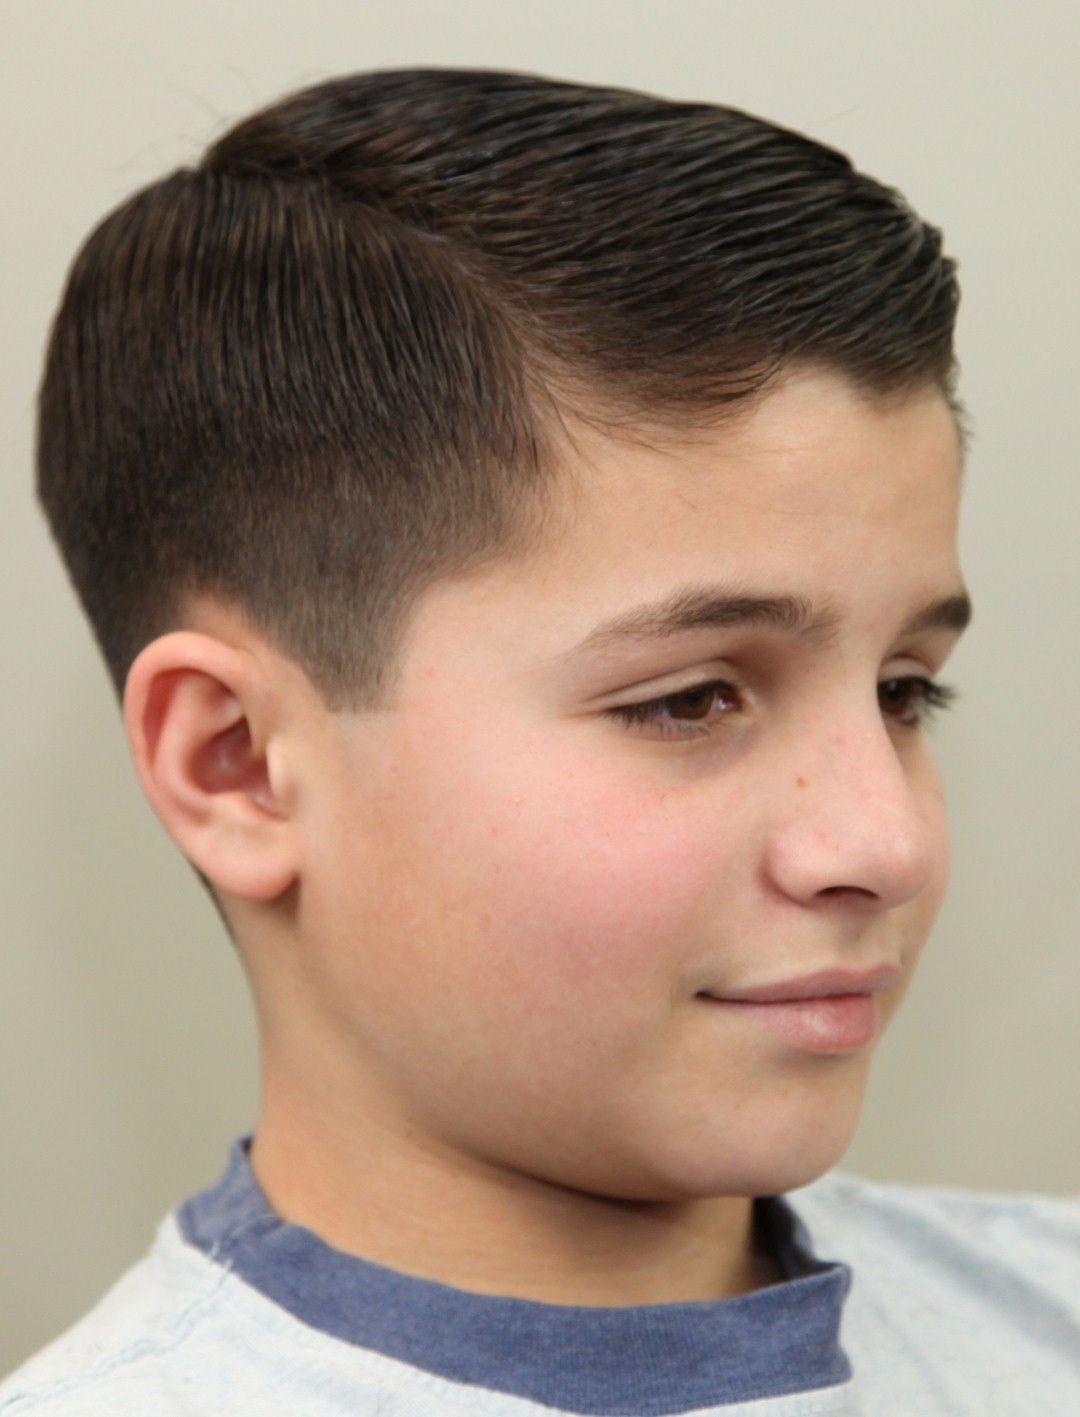 Pin On Kids Hair Style 2019